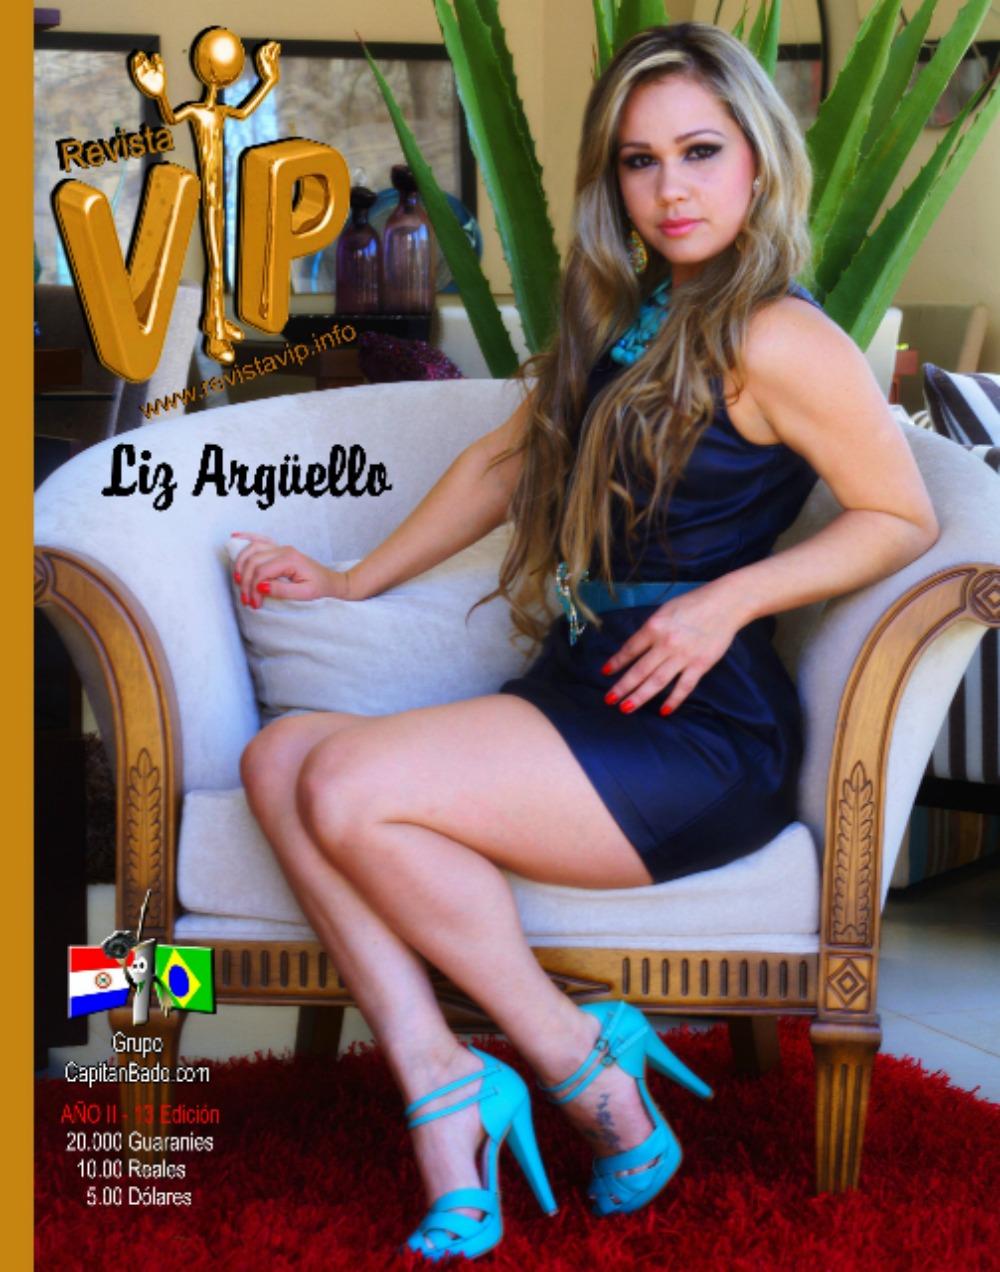 Vip 15 Paraguay